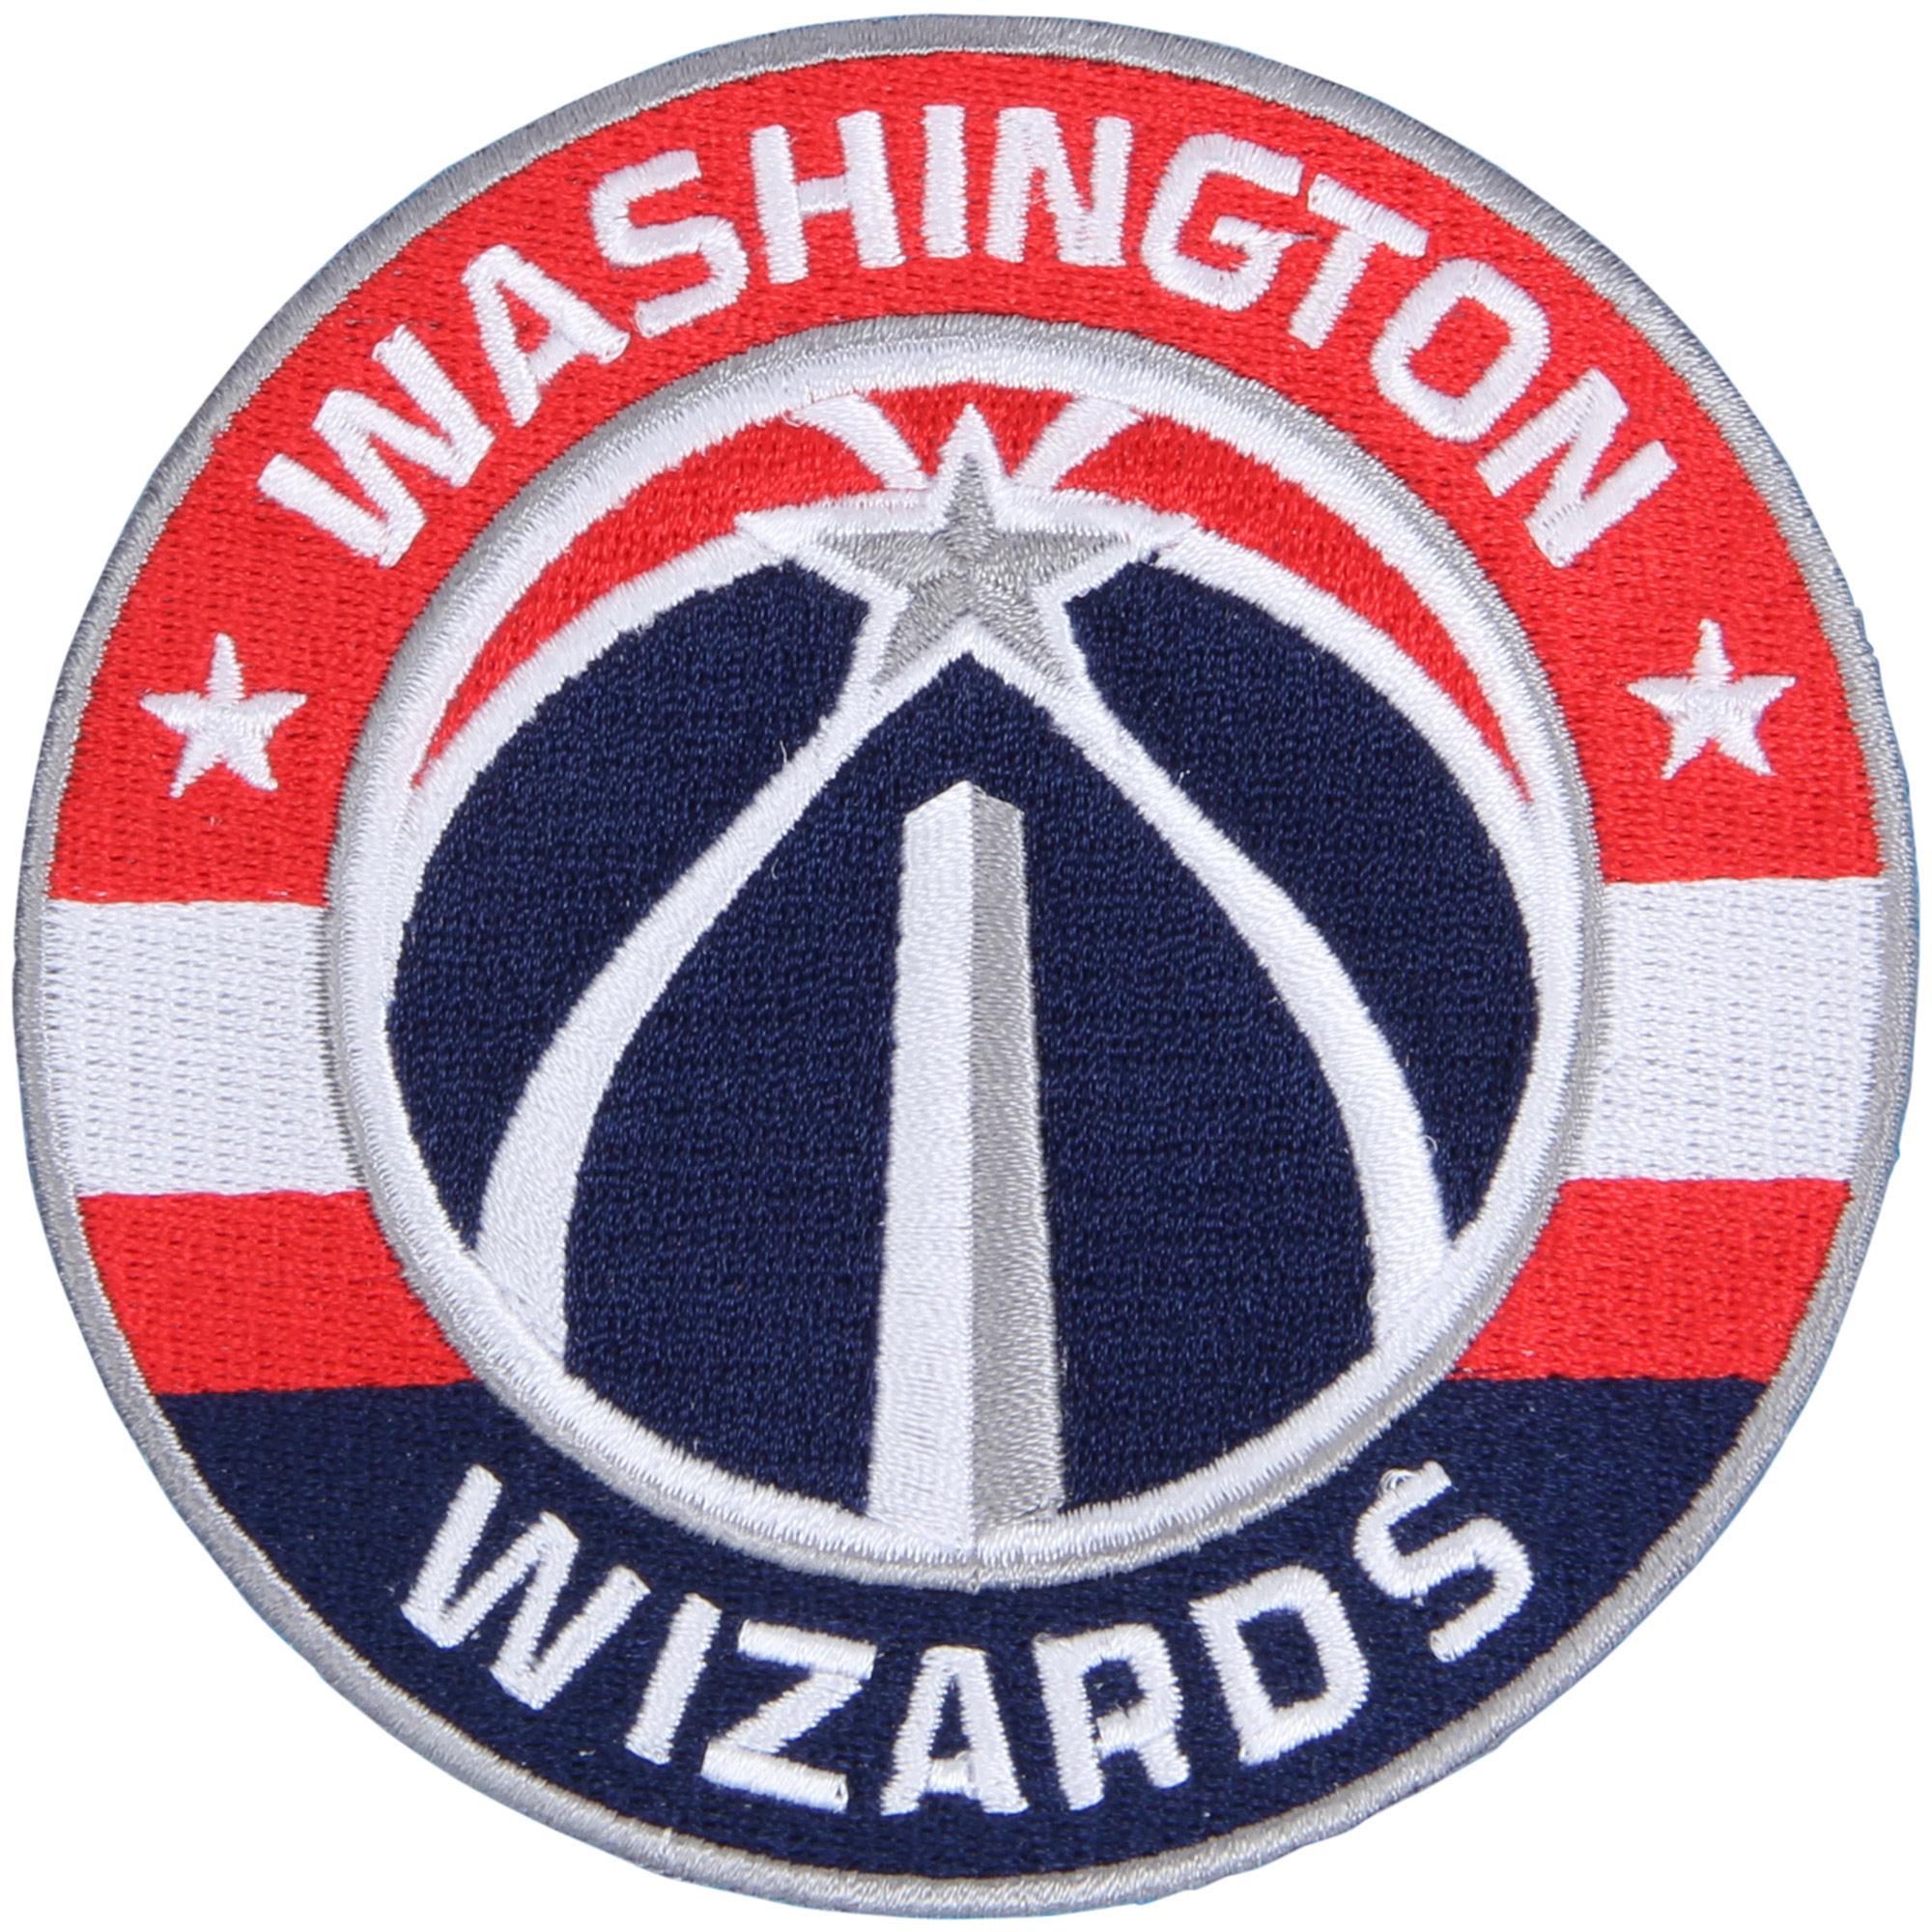 Washington Wizards Team Patch - No Size